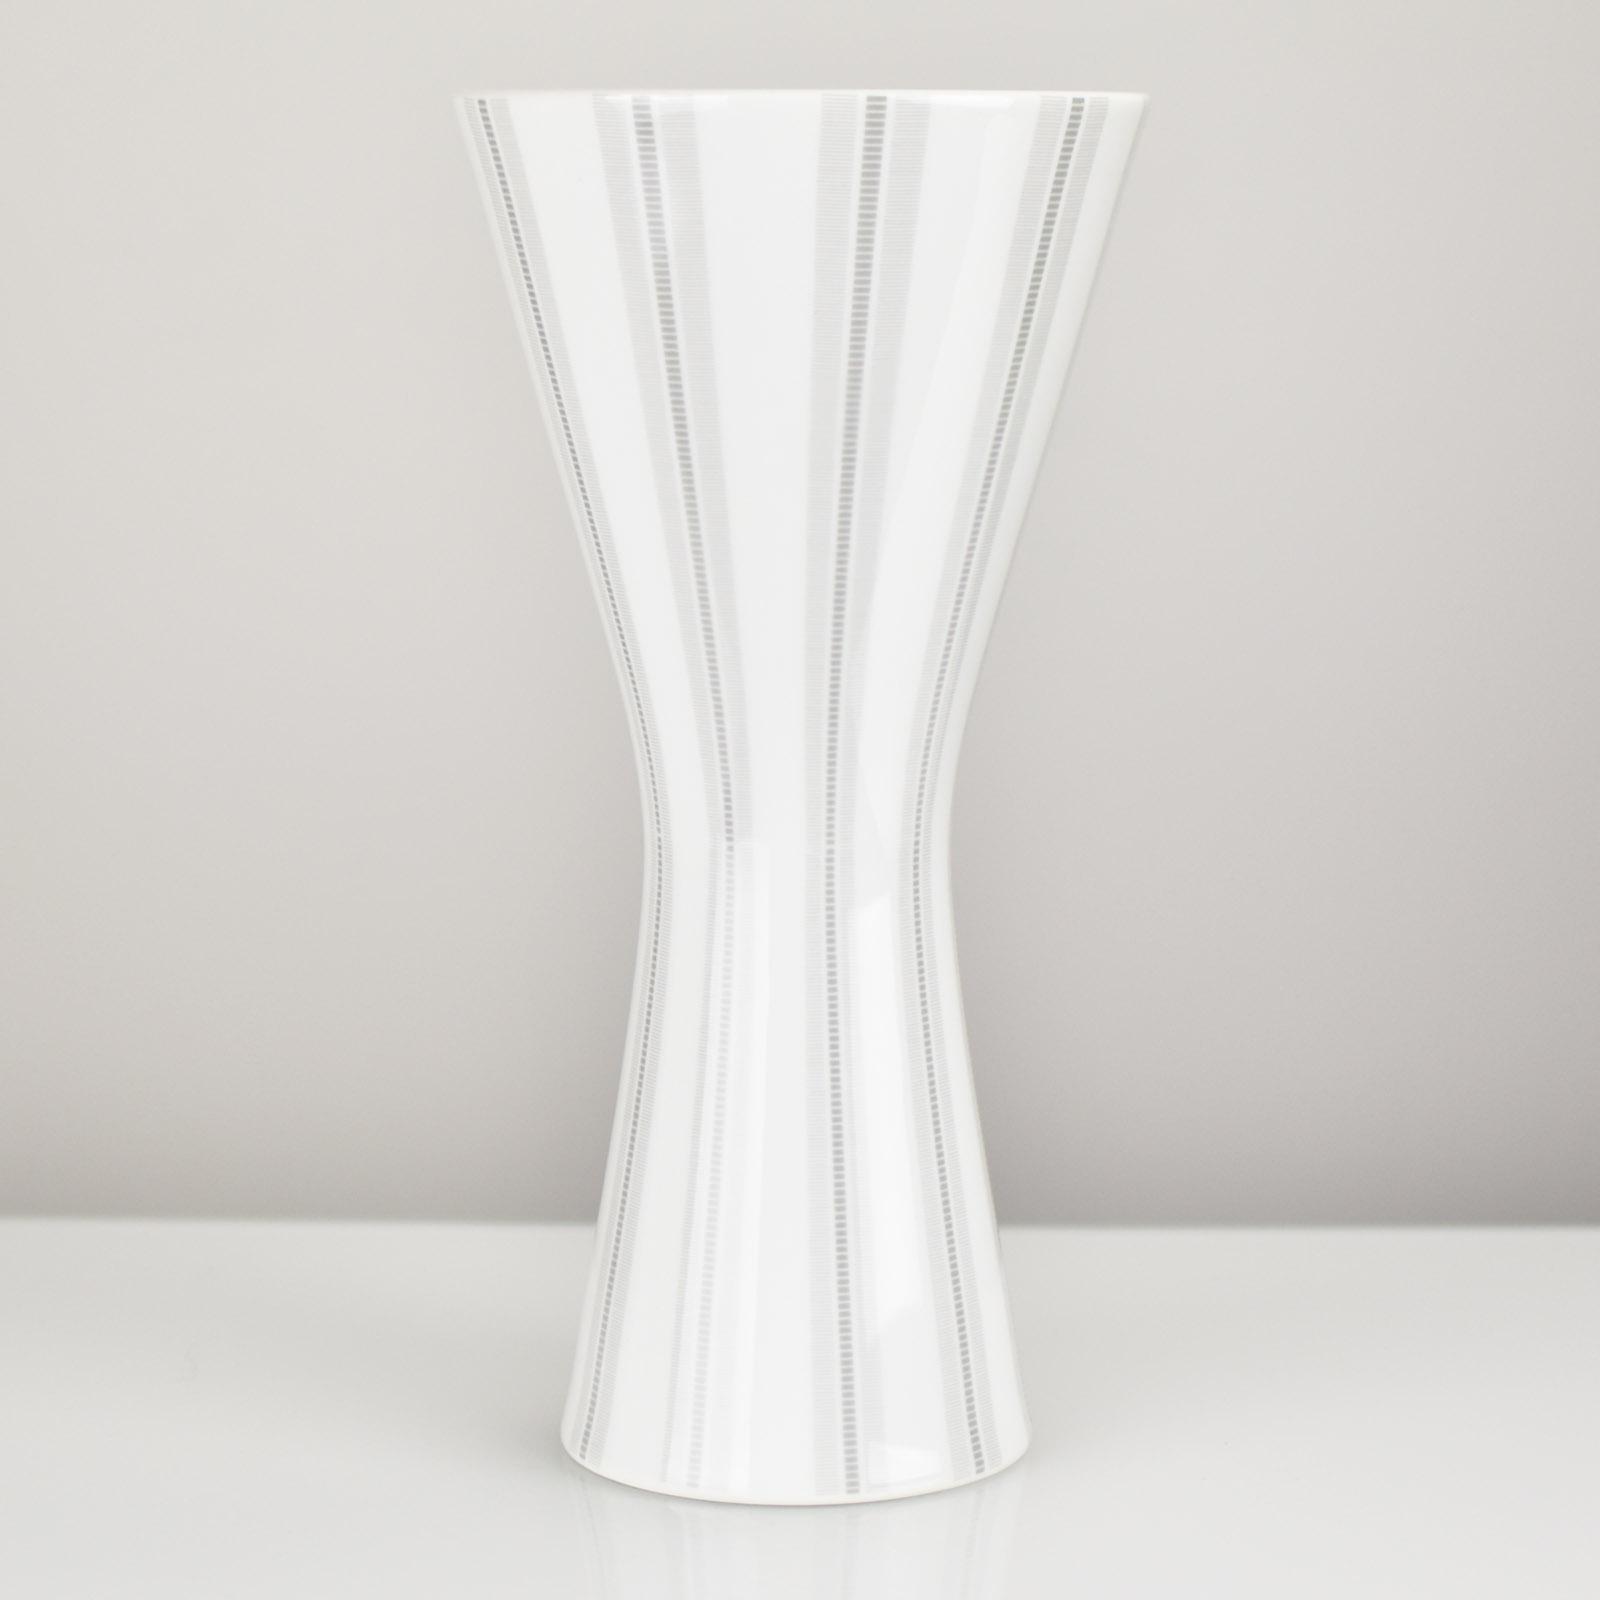 Details About Vtg 1950s German Op Art Porcelain Diabolo Vase By Heinrich Mid Century Modern